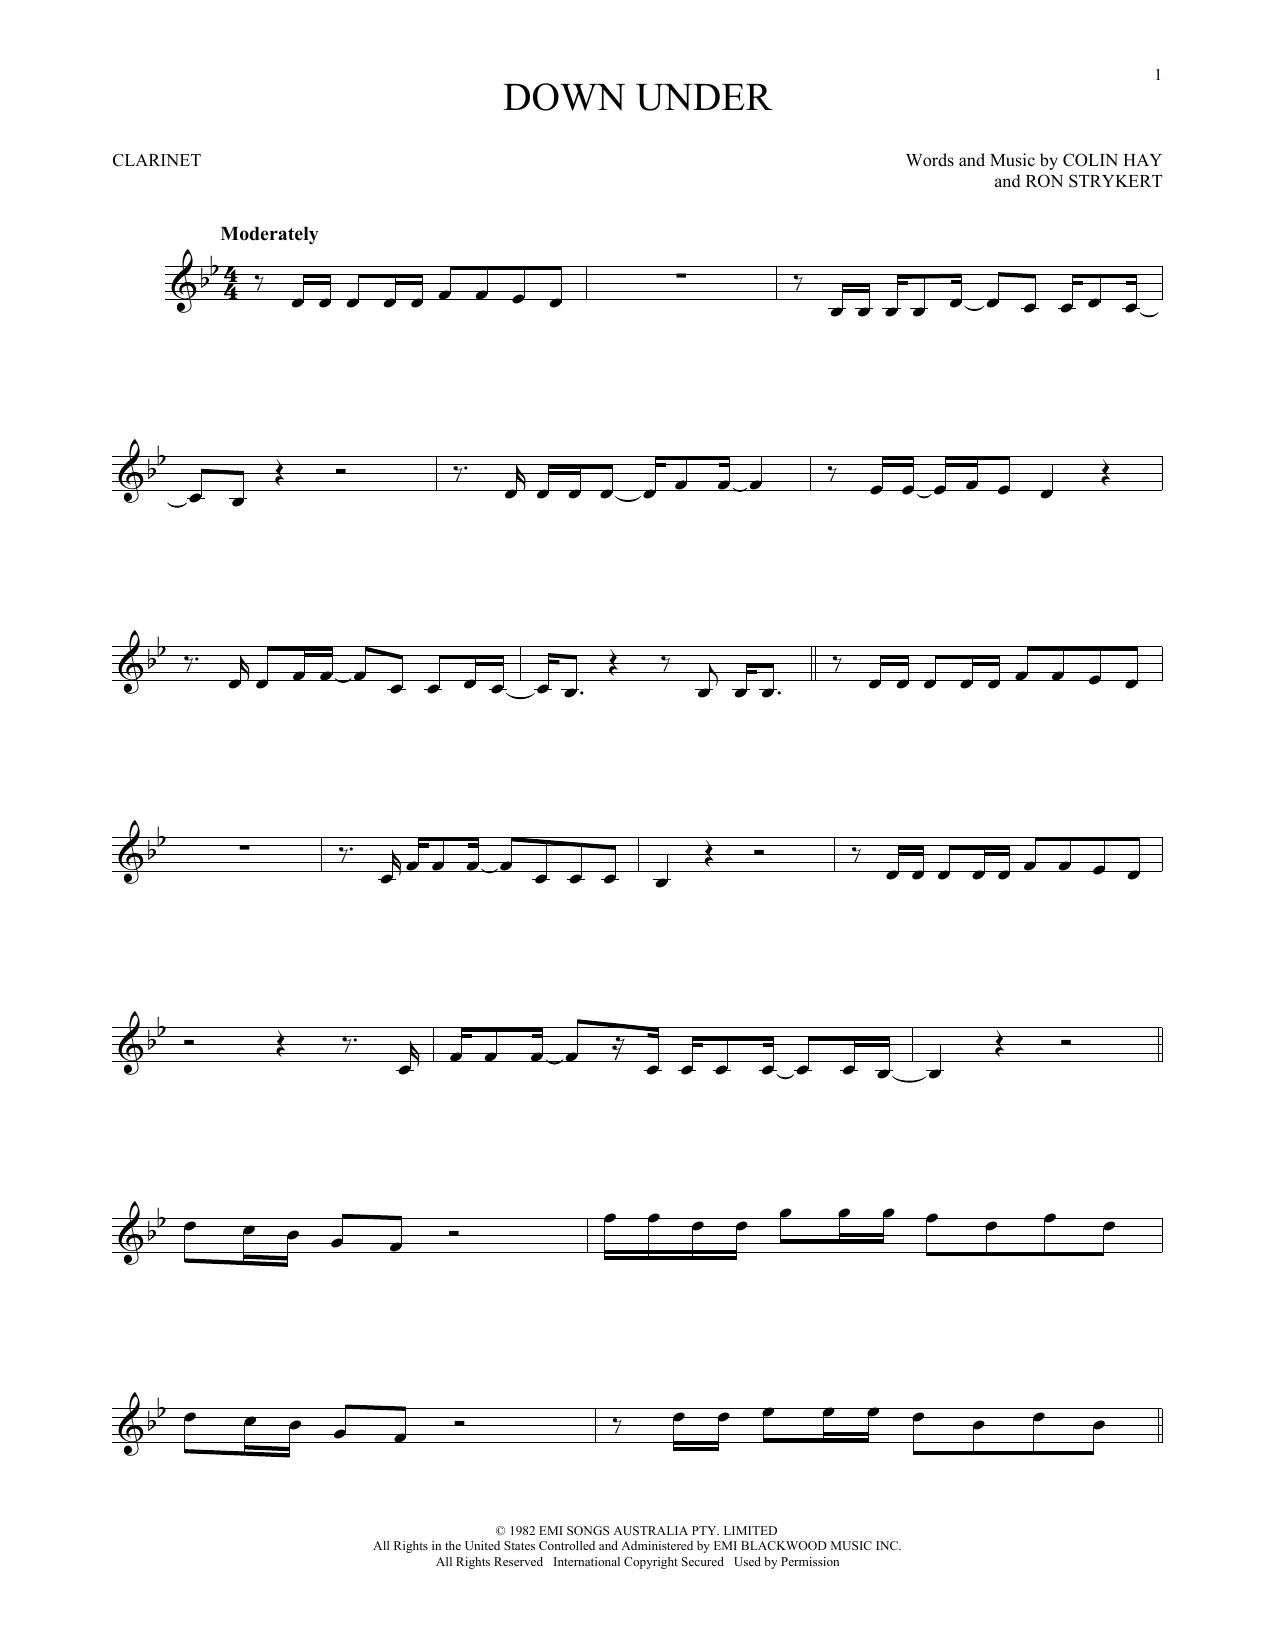 Down Under (Clarinet Solo)